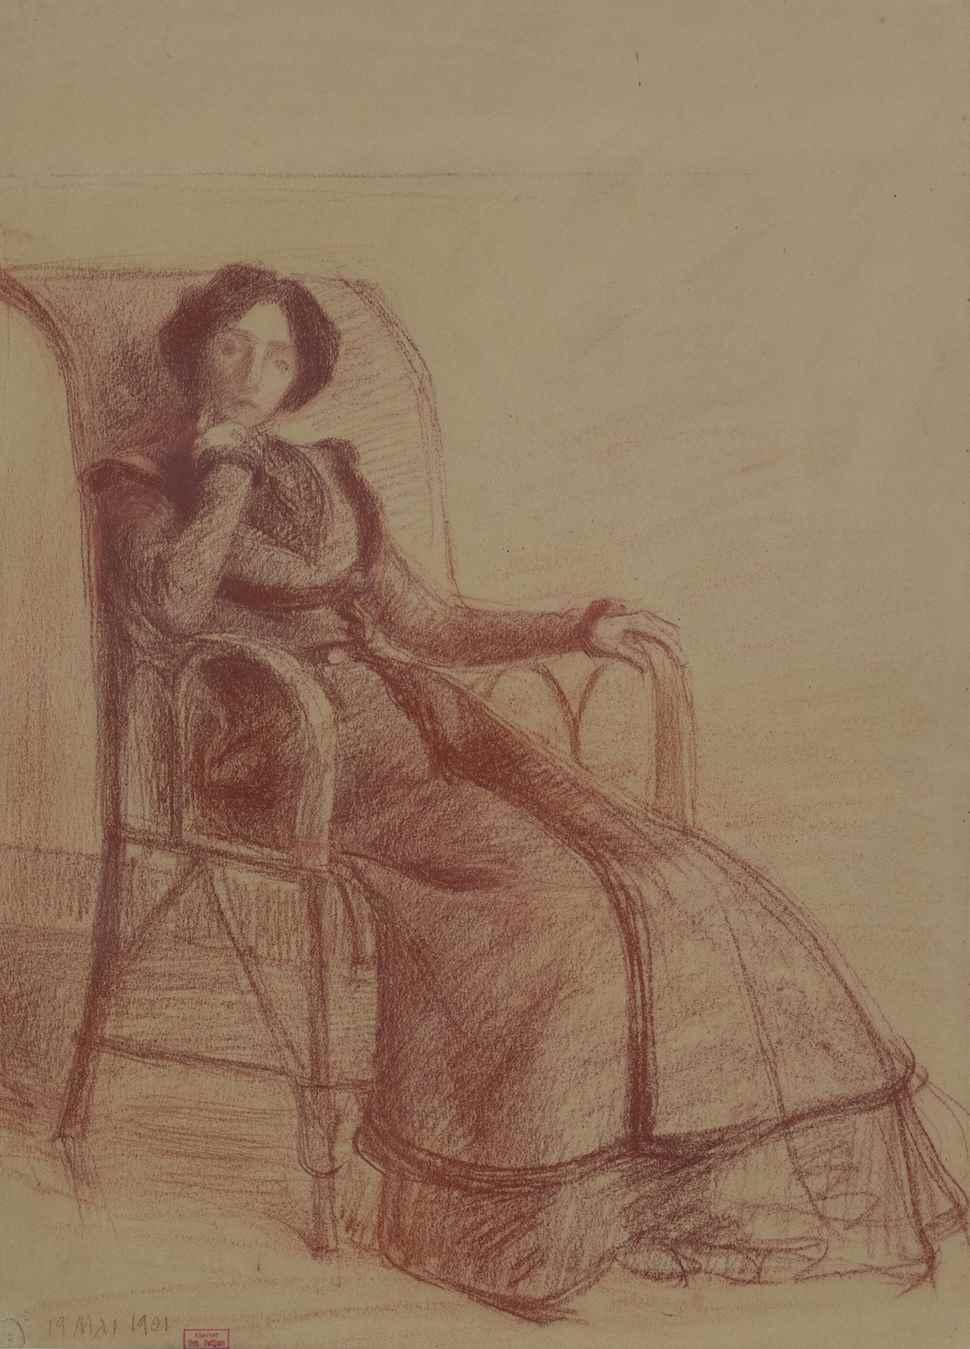 Madame Petitjean Assise, 19 mai 1901 - Hippolyte Petitjean (1854 - 1929)